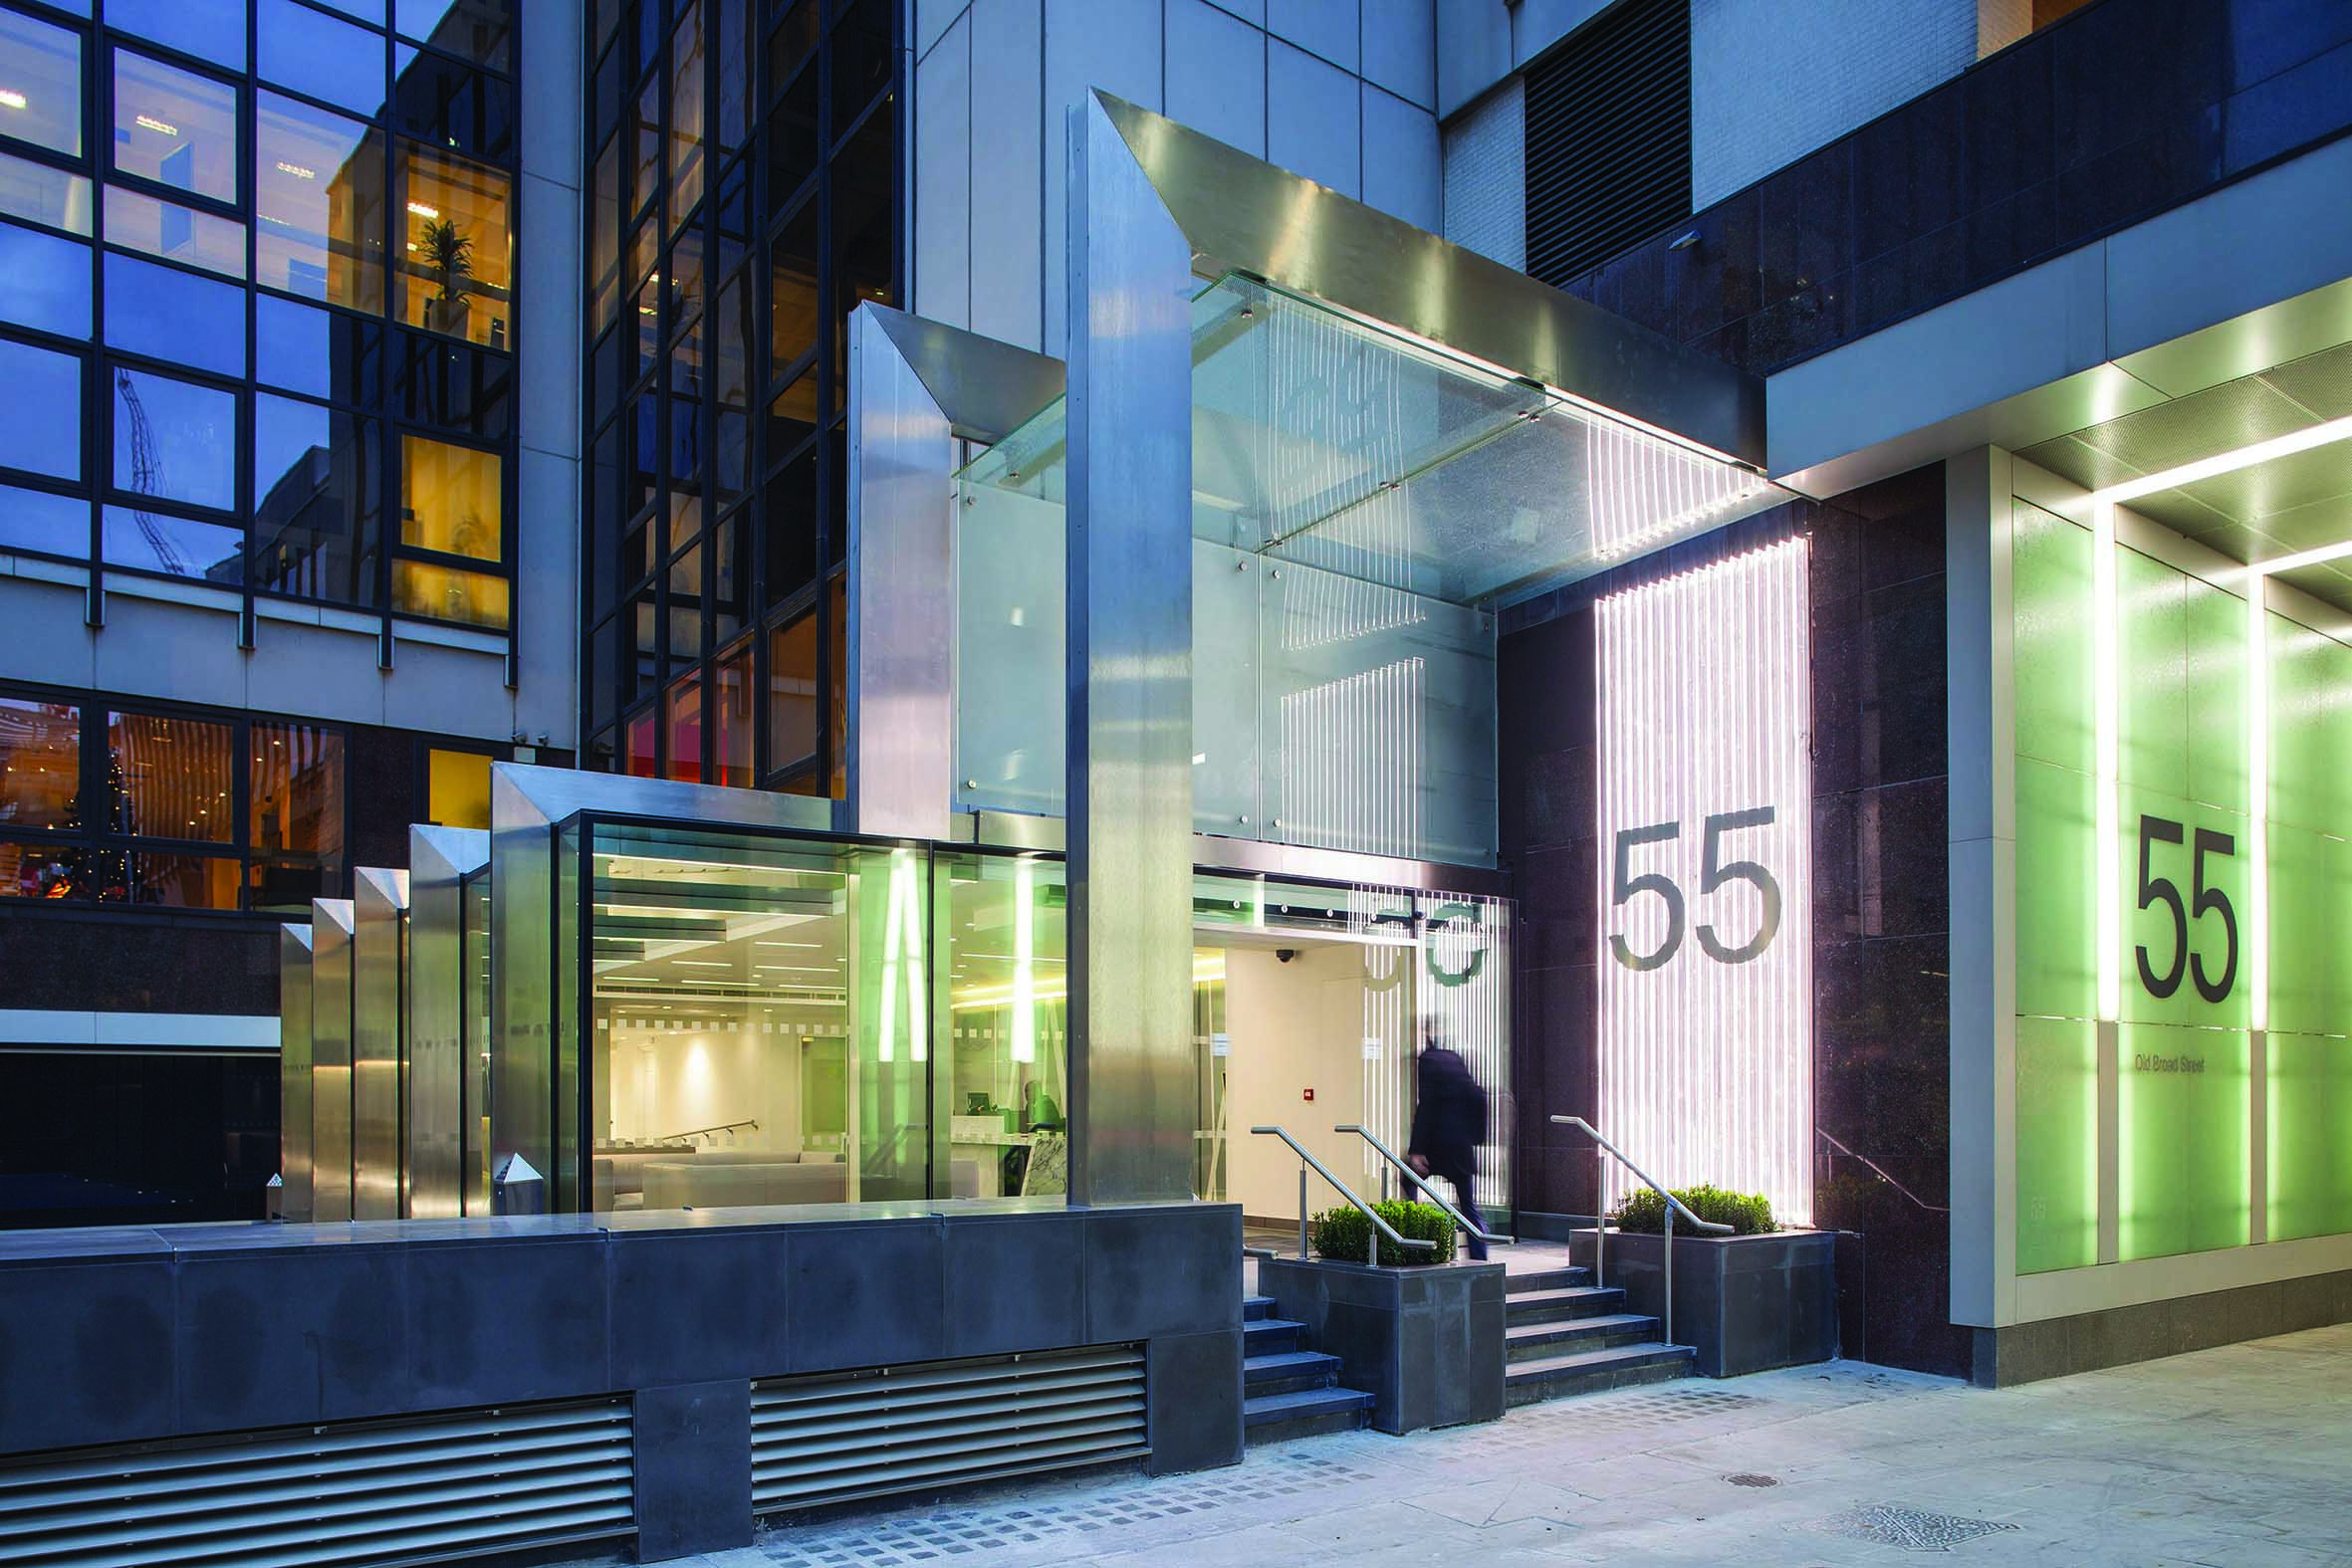 Office London, EC2M 1RX - 55 Old Broad Street